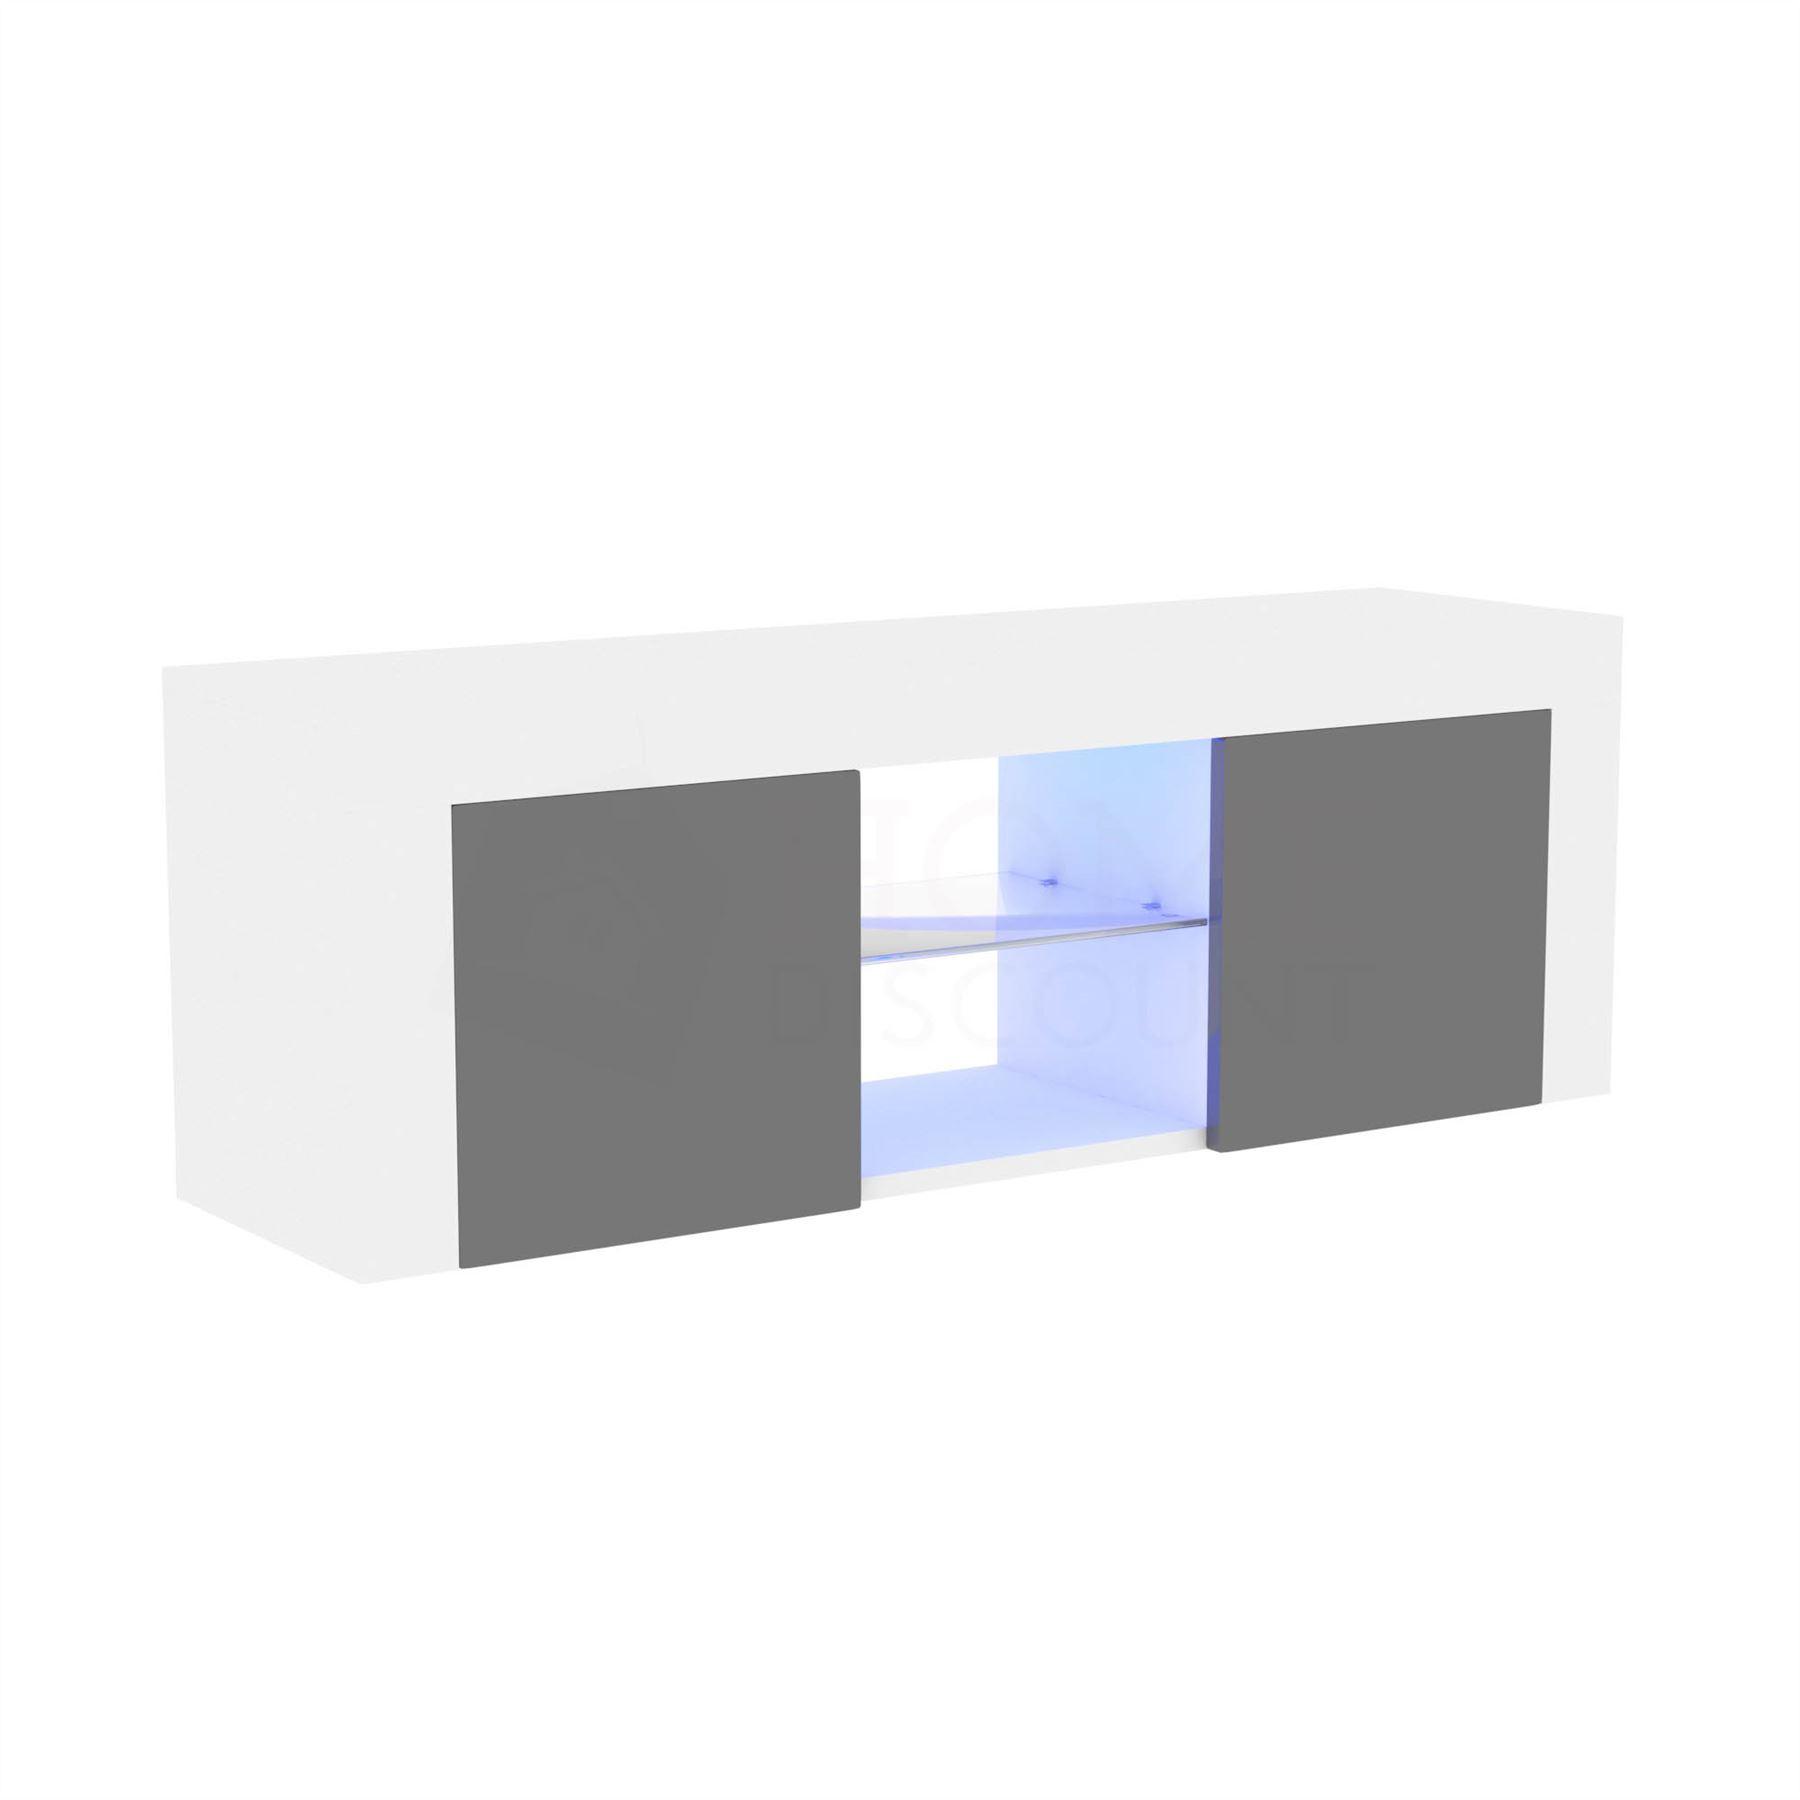 thumbnail 55 - Modern White TV Unit Cabinet Stand Matt body and High Gloss Doors LED Lights